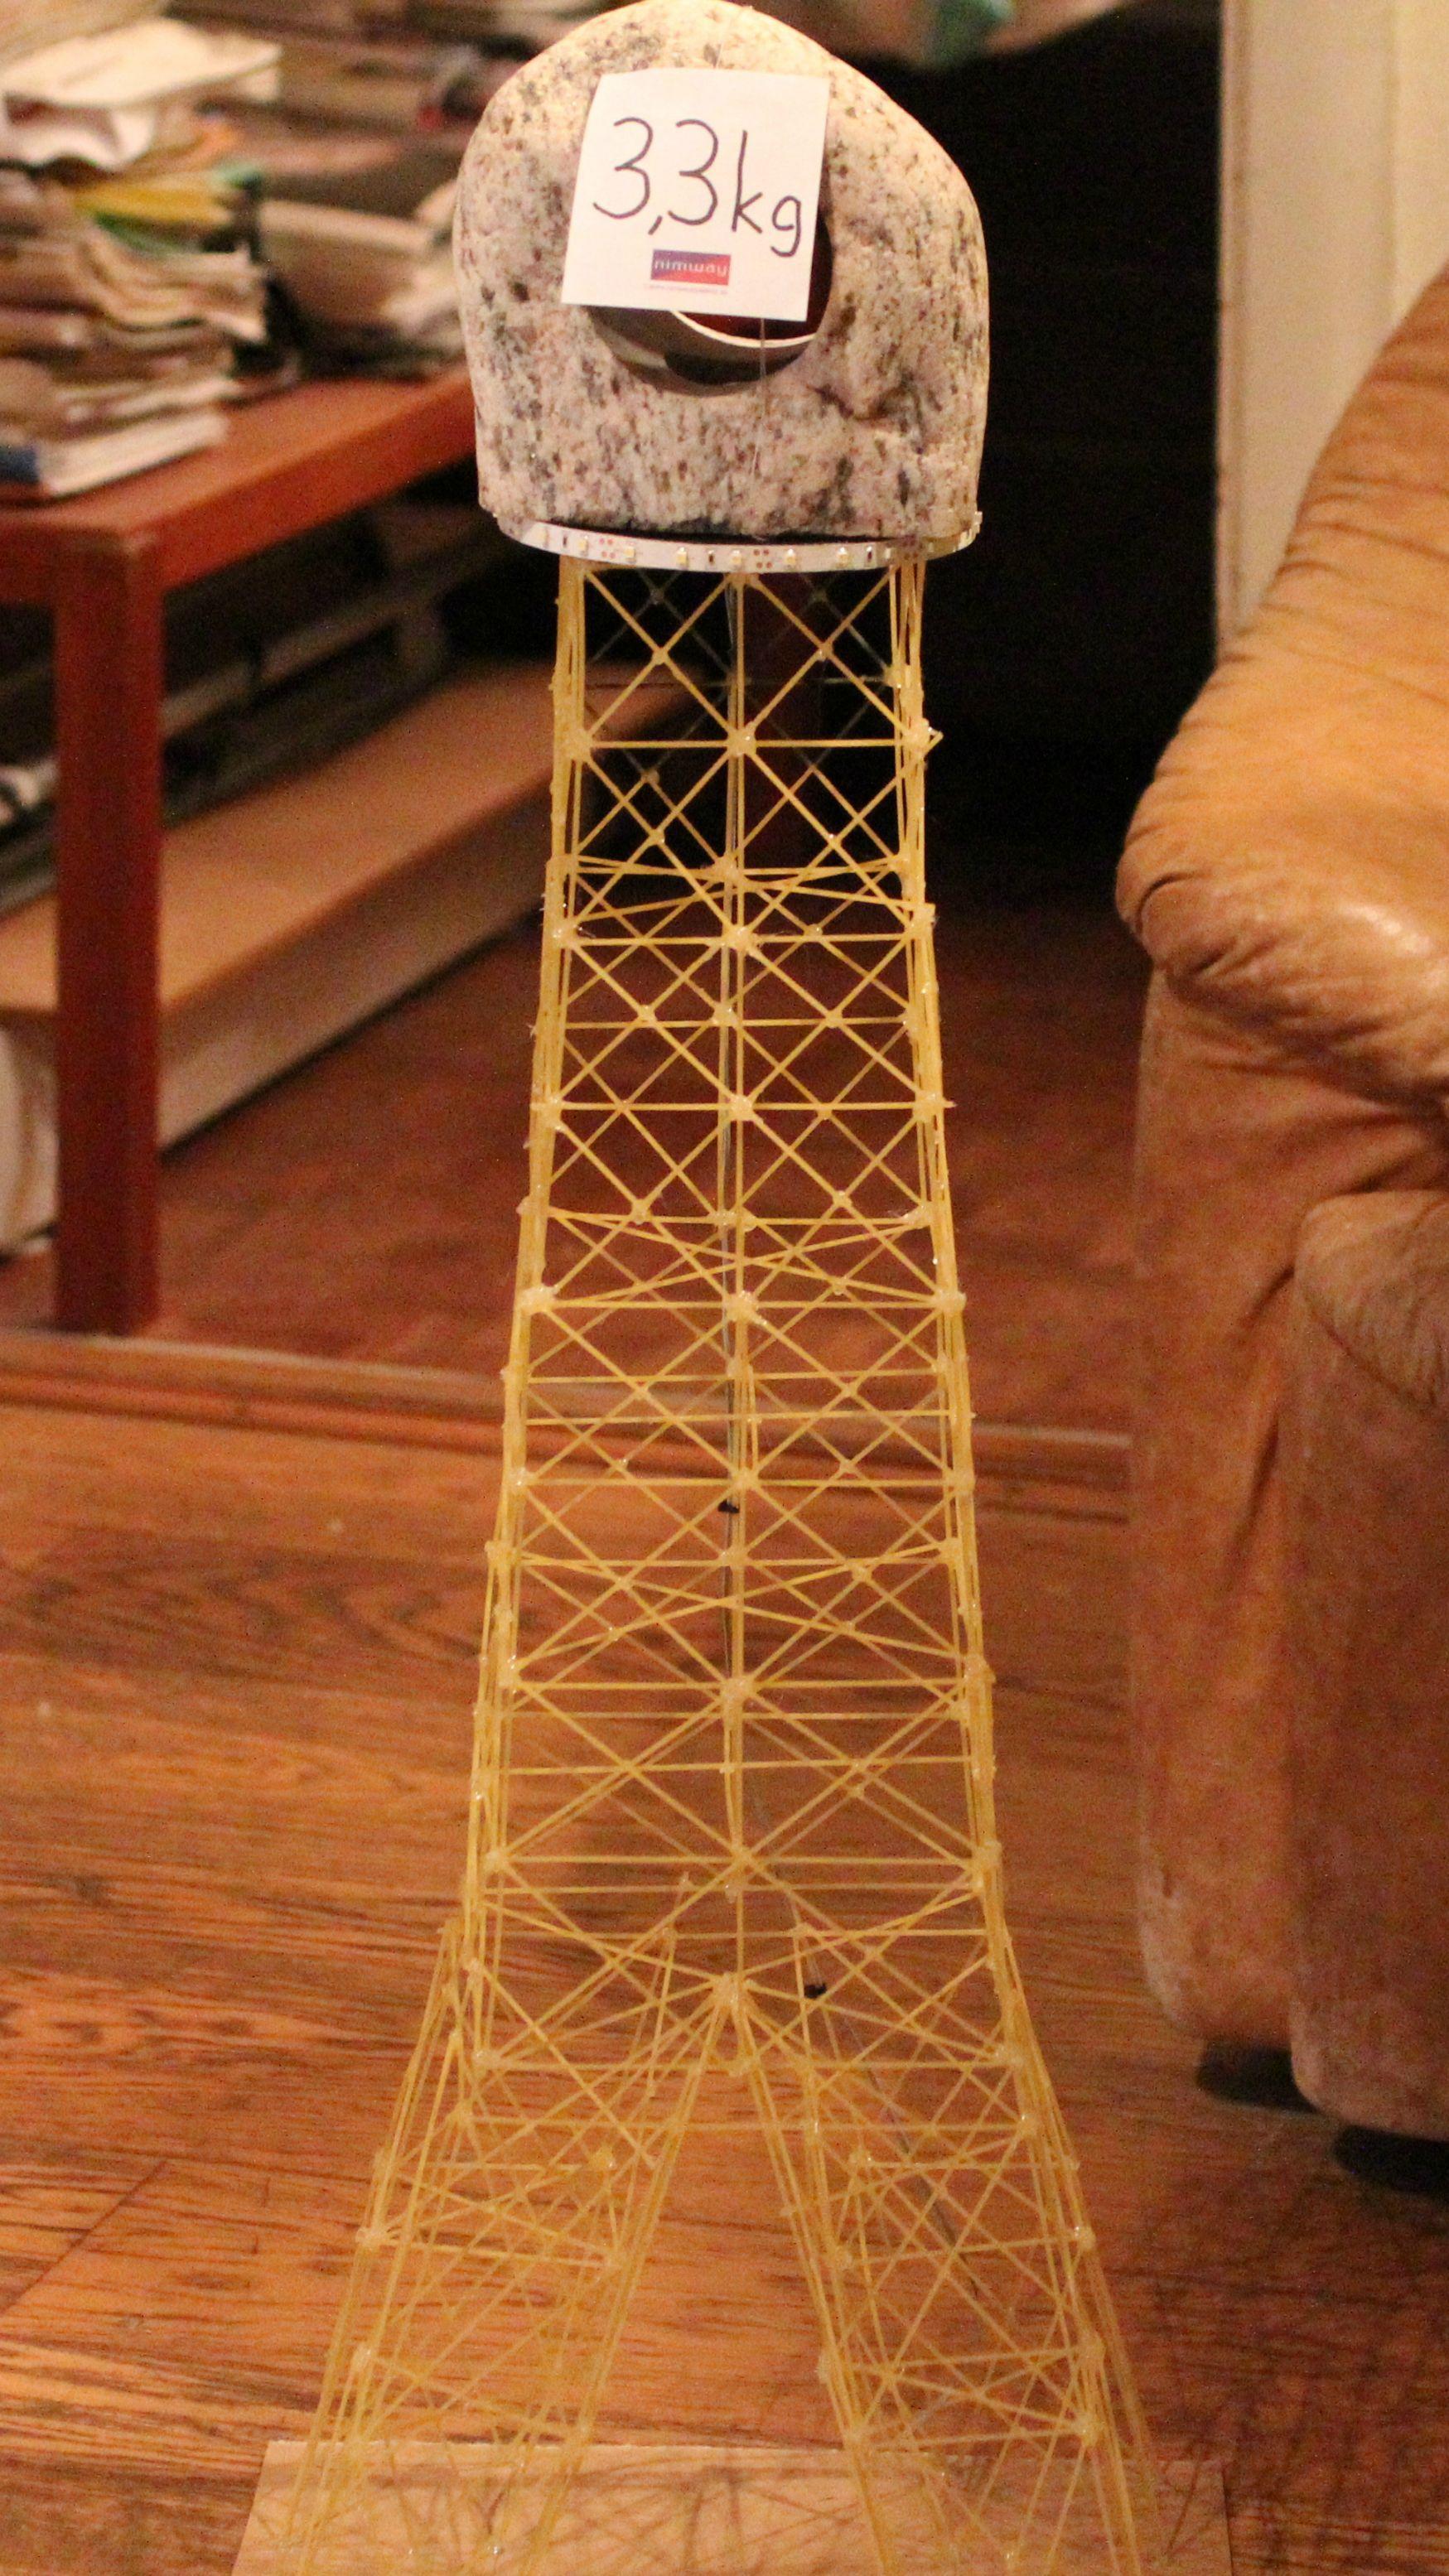 Structural Integrity Of A Spaghetti Eiffel Tower Spaghetti Tower